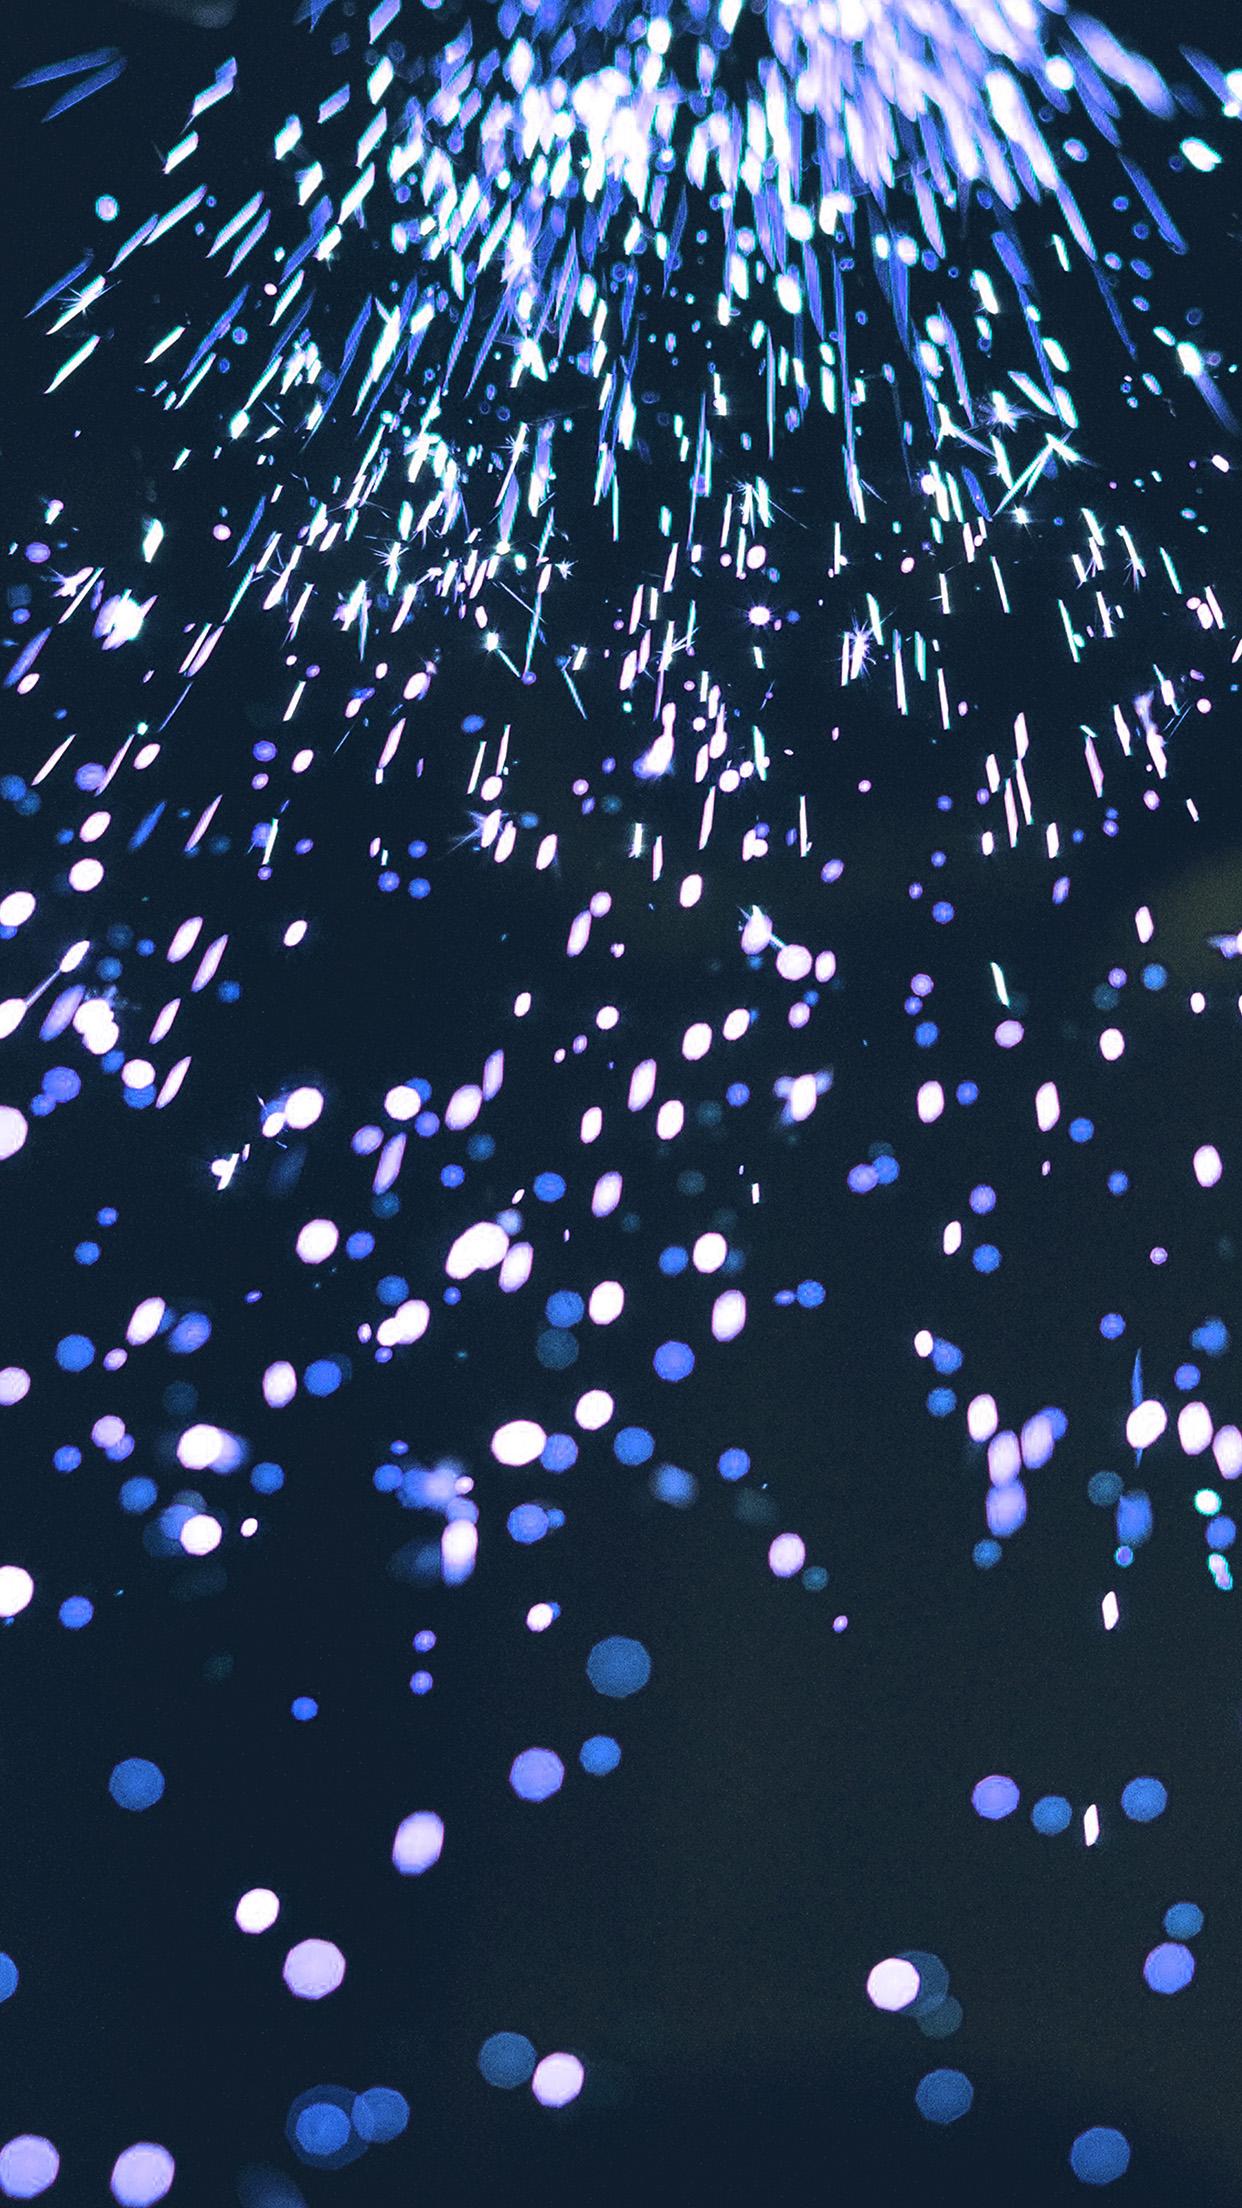 Iphone 7 Plus - Blue Fire Bokeh , HD Wallpaper & Backgrounds